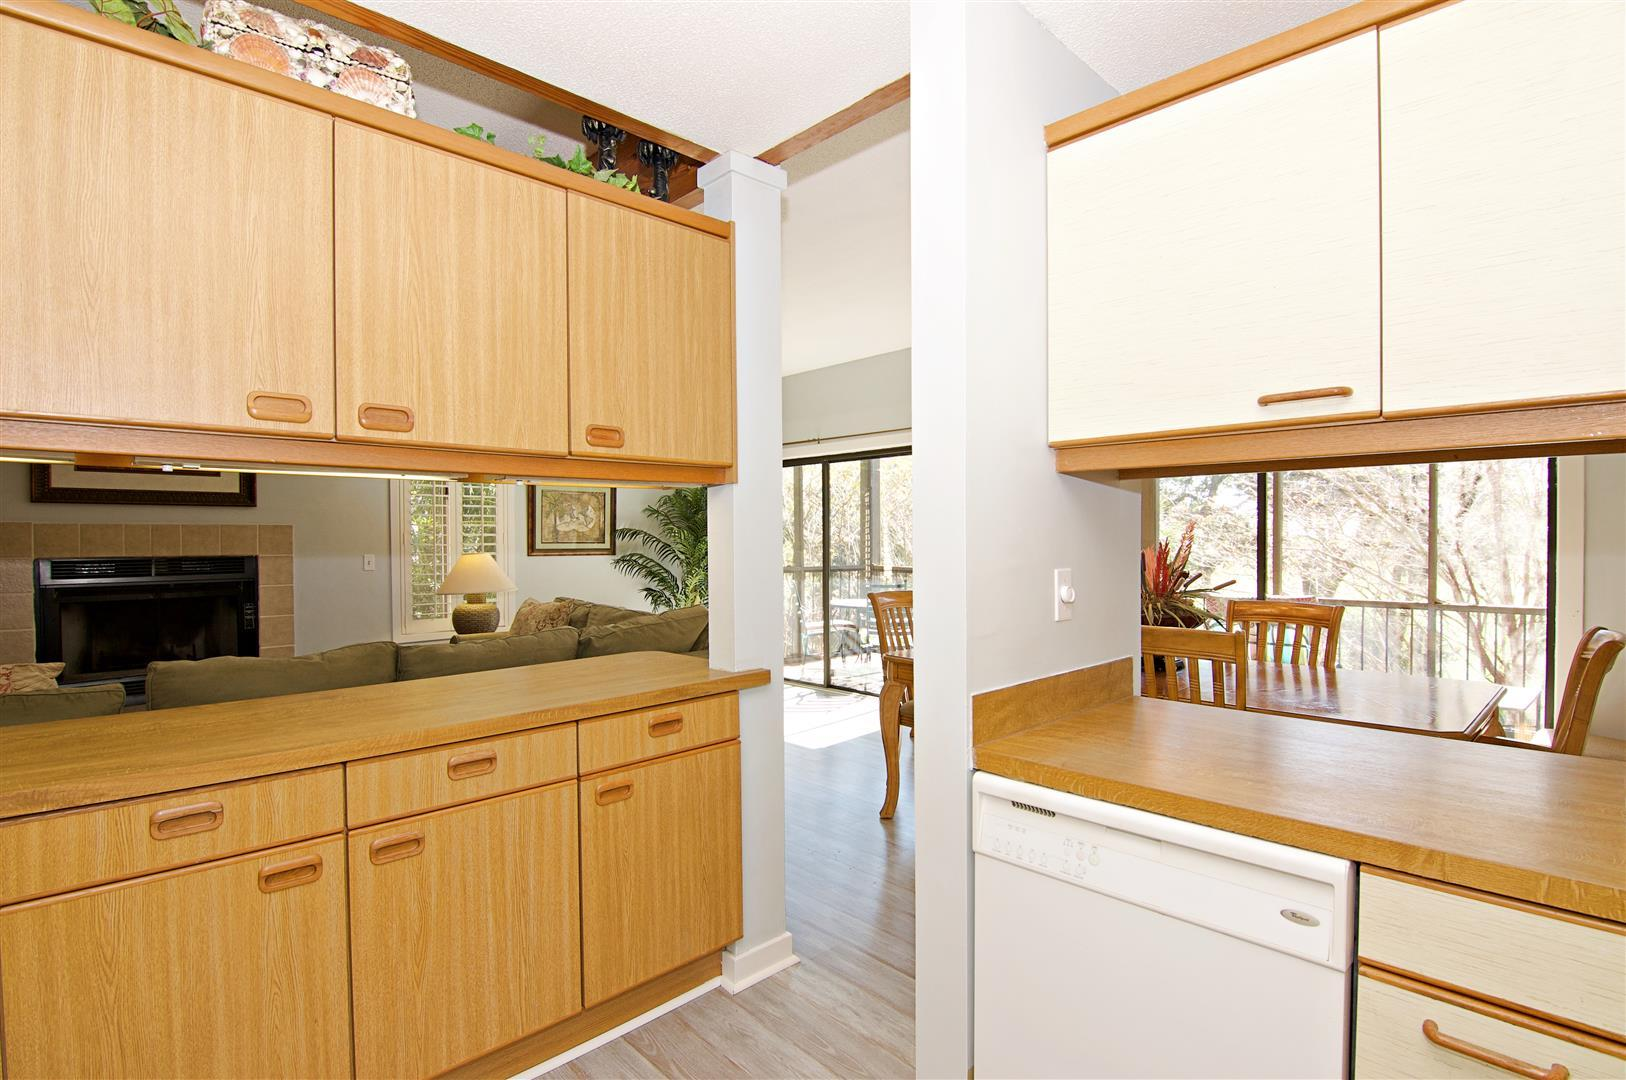 Seabrook Island Homes For Sale - 3020 Ocean Winds, Seabrook Island, SC - 37